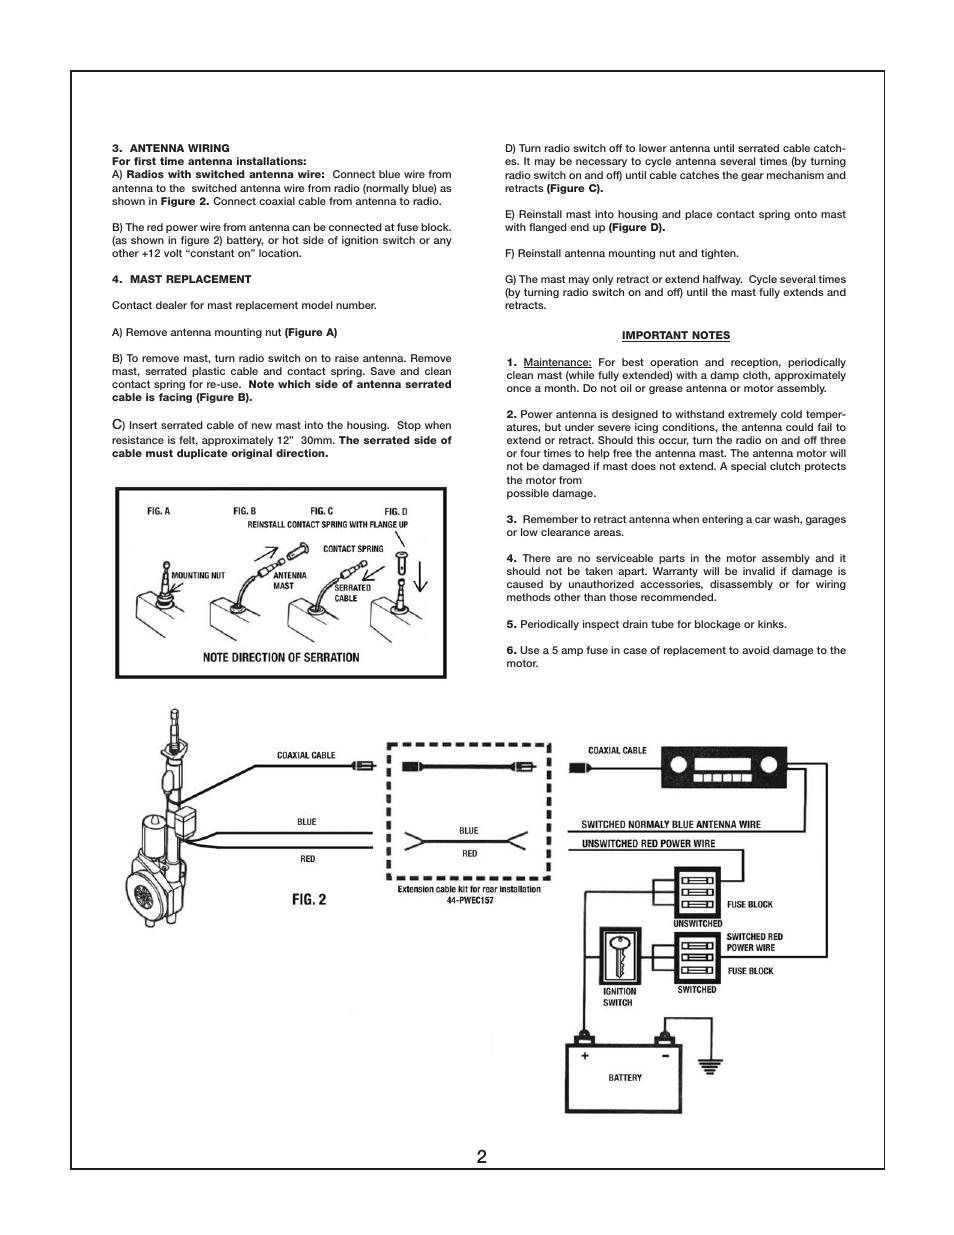 metra electronics aw pw22 user manual page 2 8 original mode rh manualsdir com Metra Dash Kits Metra Electric